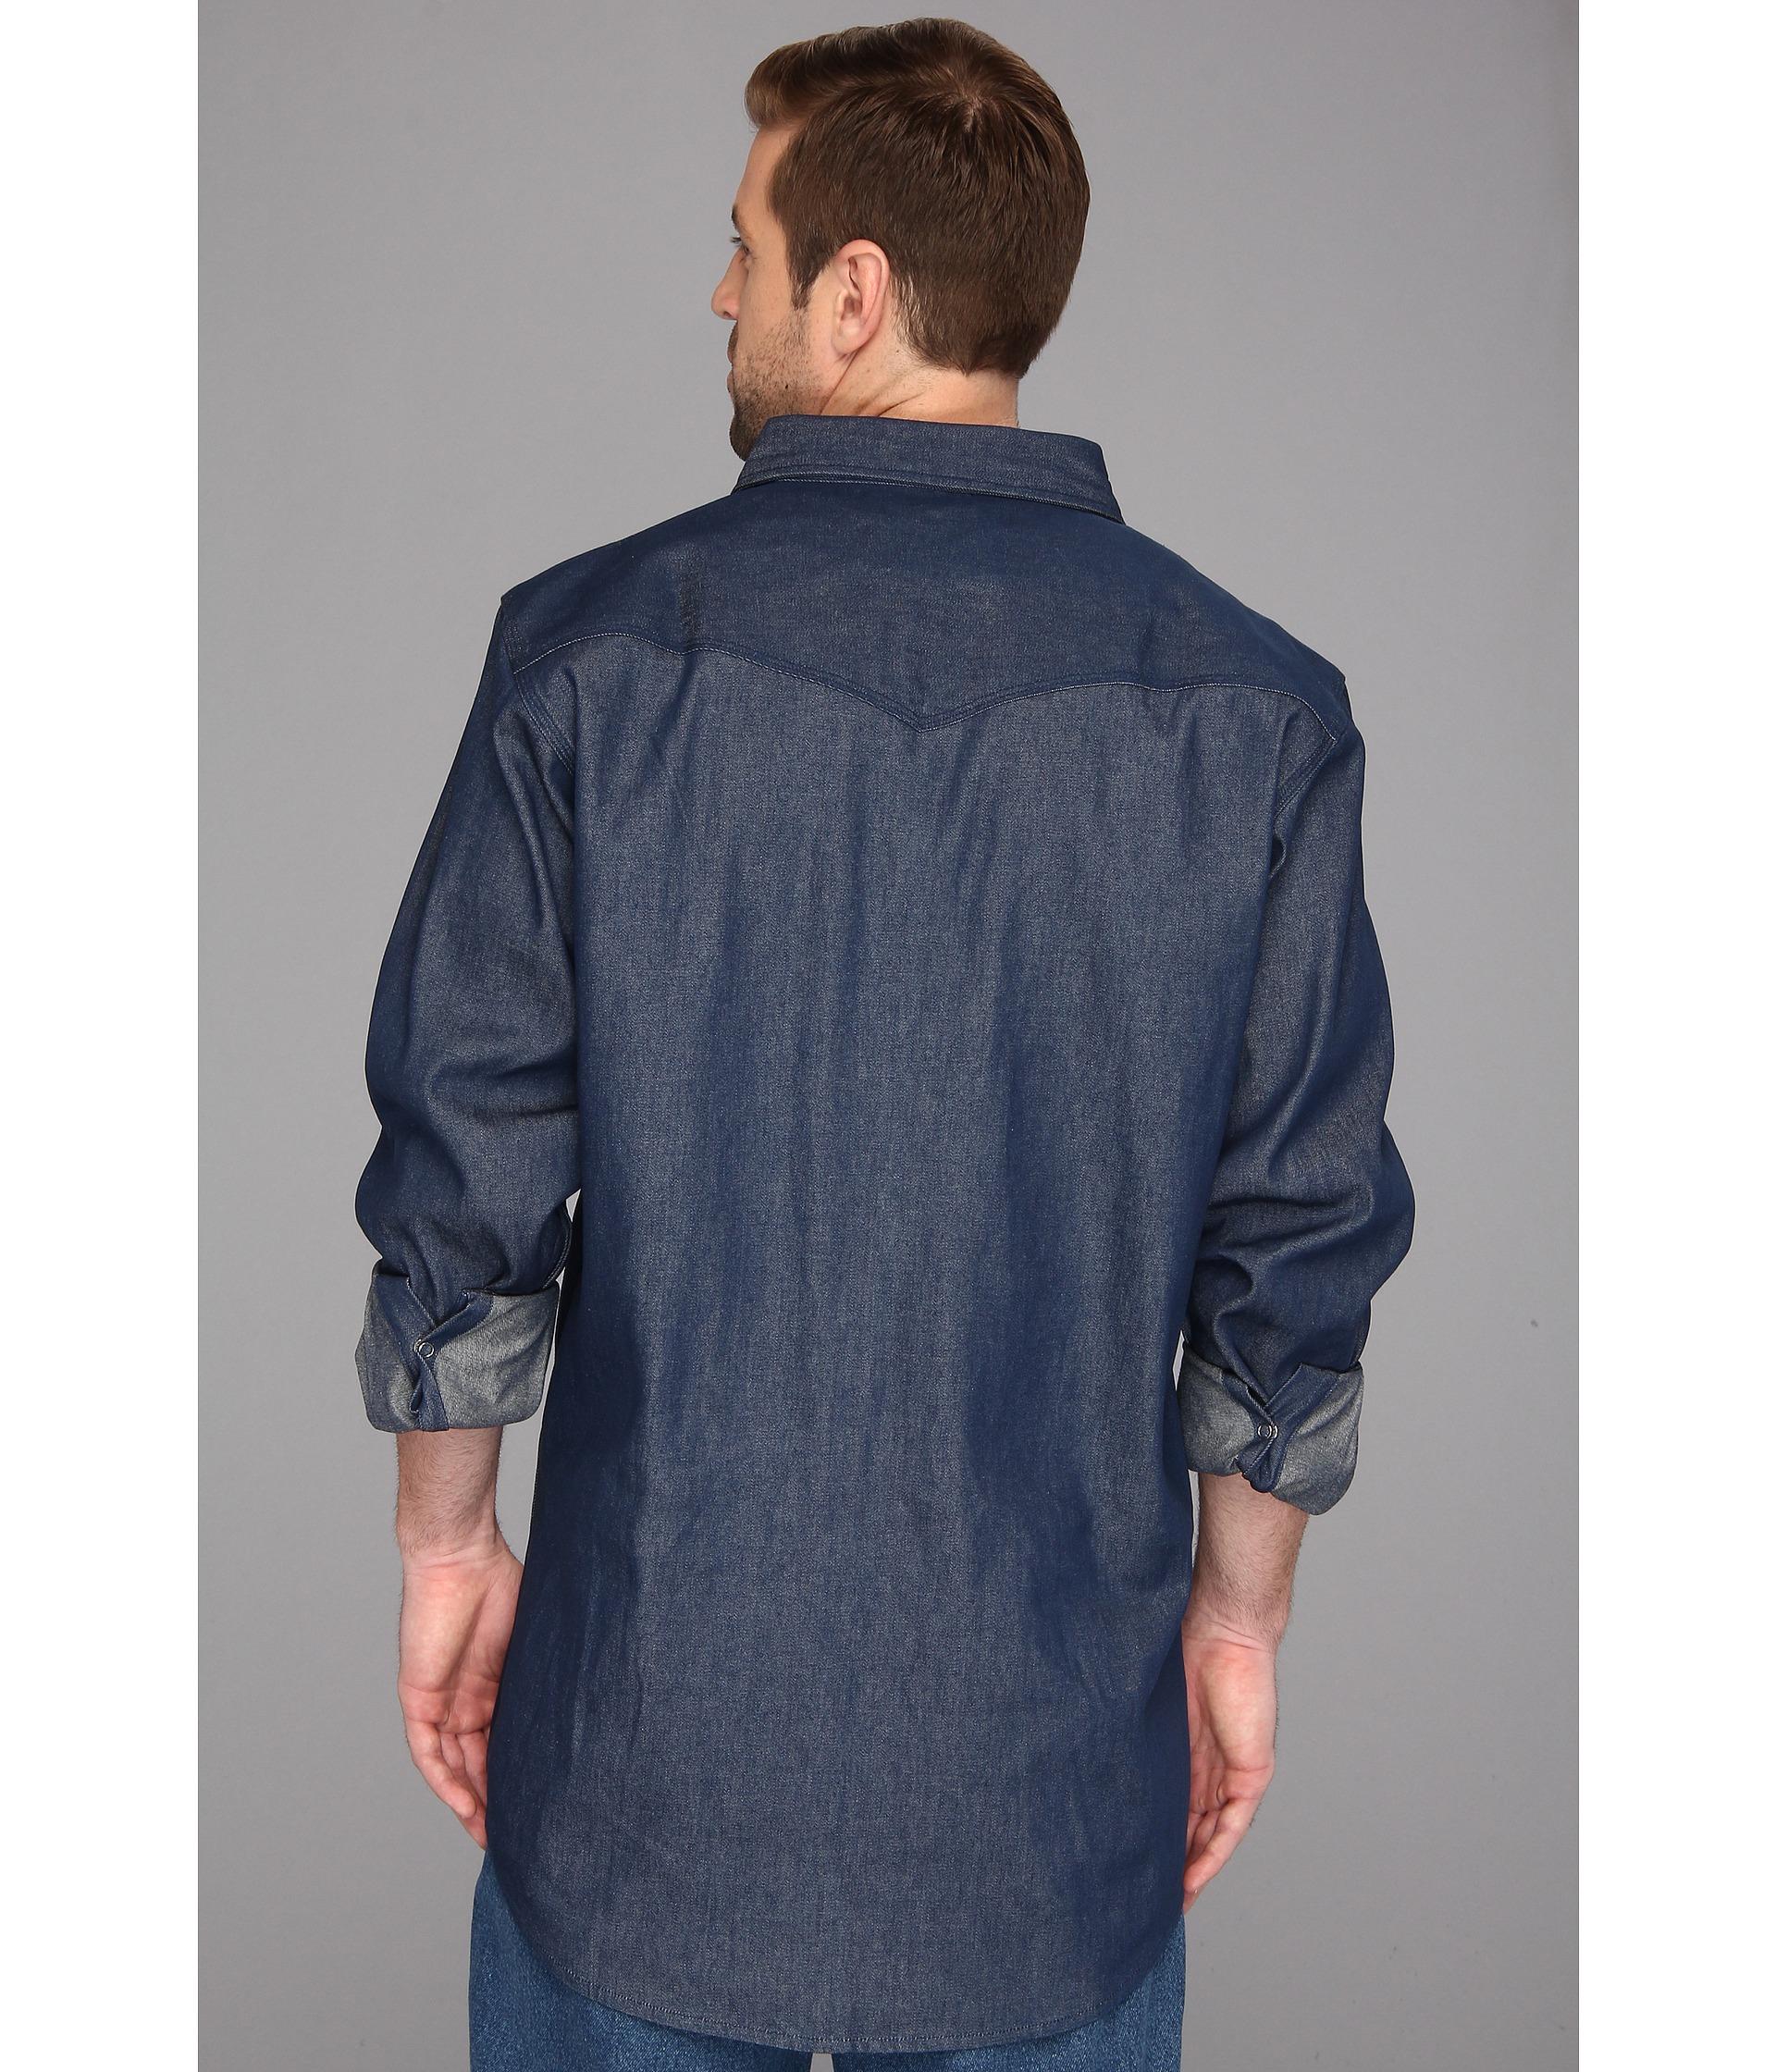 e2294487c2e Lyst - Carhartt Ironwood Denim Work Shirt - Tall in Blue for Men